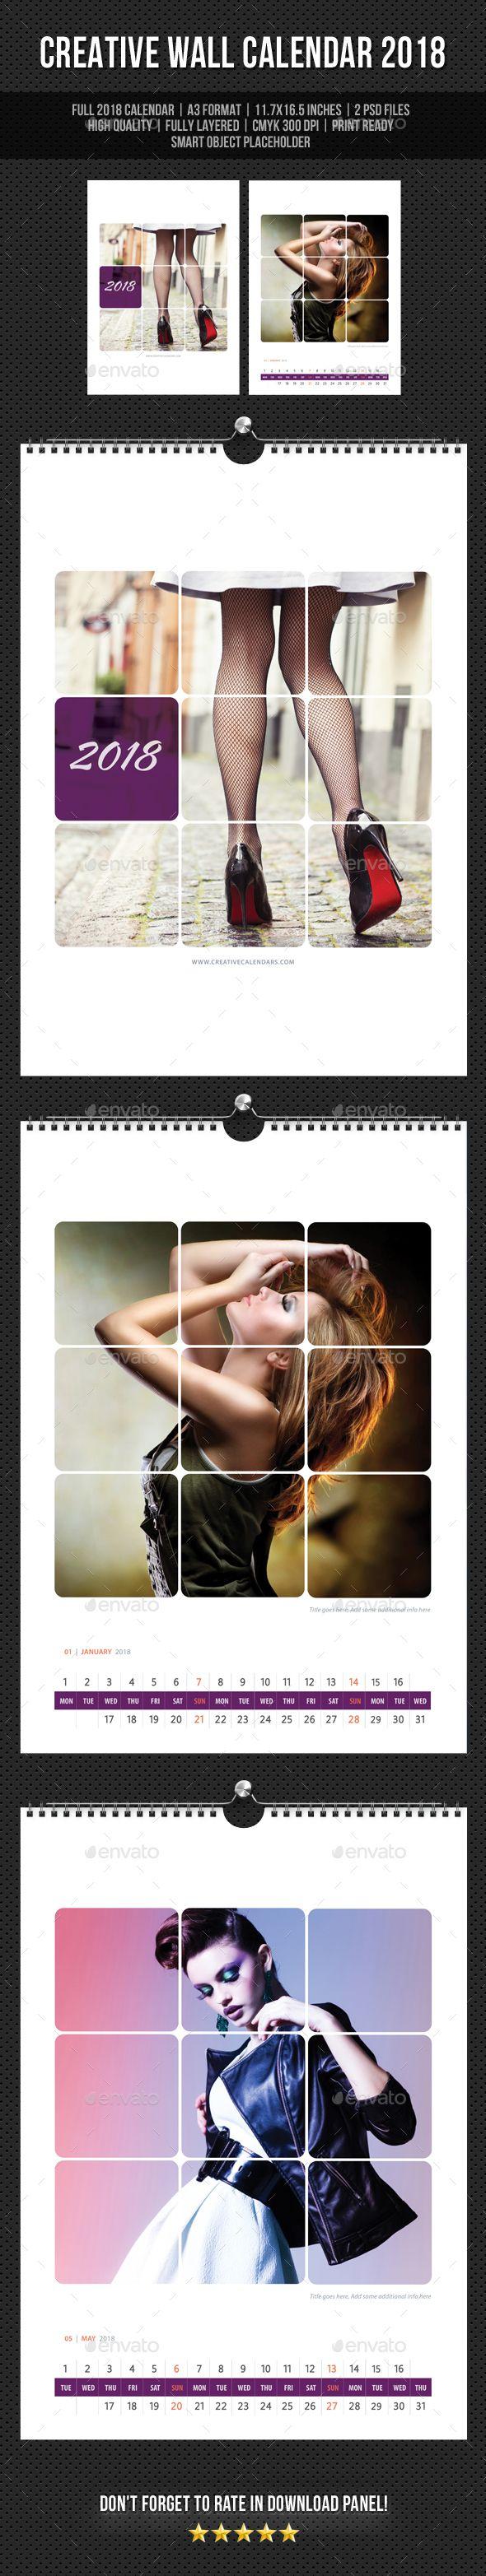 #Creative #Wall #Calendar #template #2018 V18 - Calendars Stationery #design. download: https://graphicriver.net/item/creative-wall-calendar-2018-v18/20283324?ref=yinkira